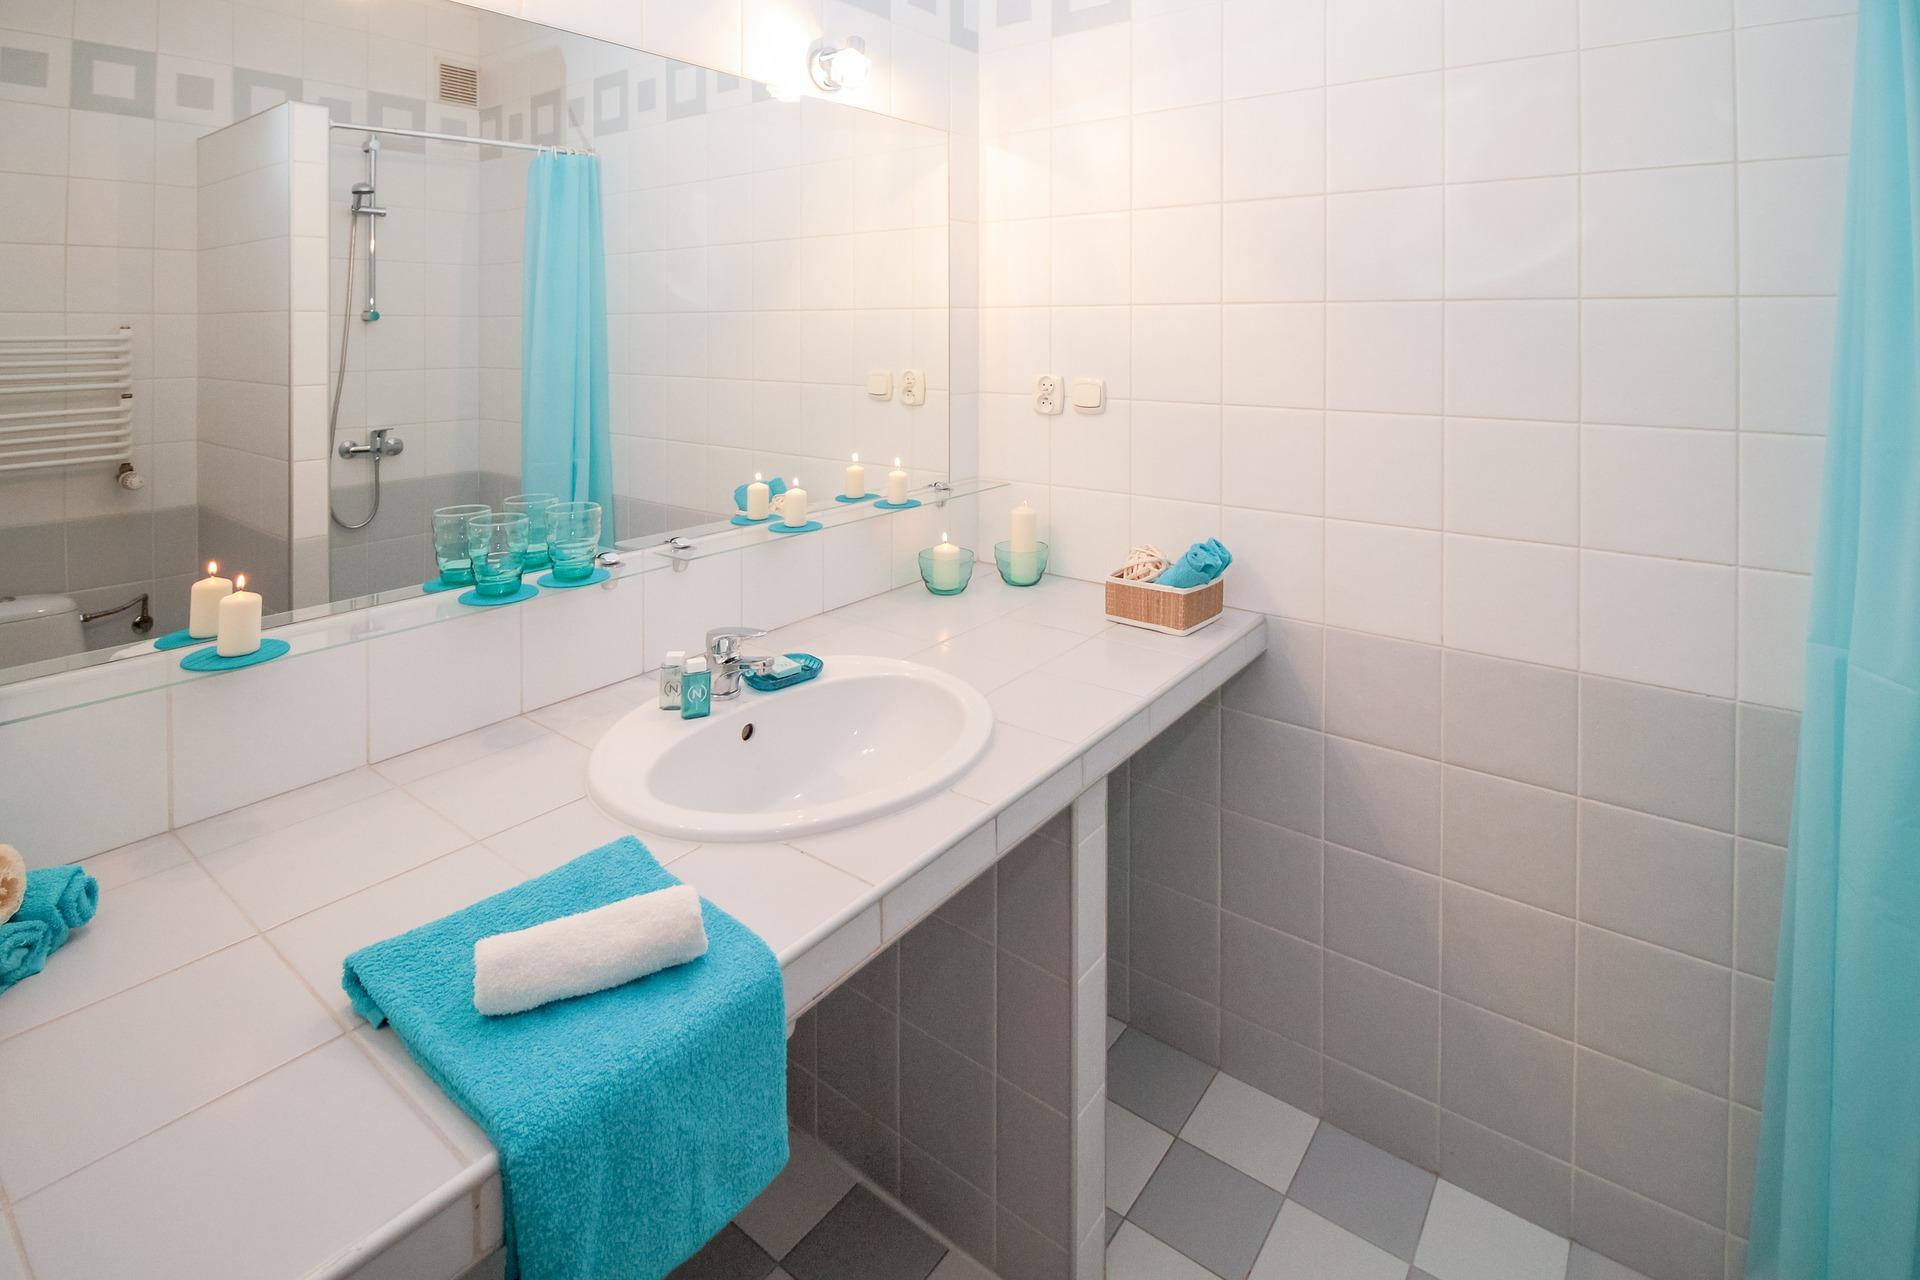 Kleine Badkamer Inrichten : Kleine badkamer inrichten vrije sector wonen